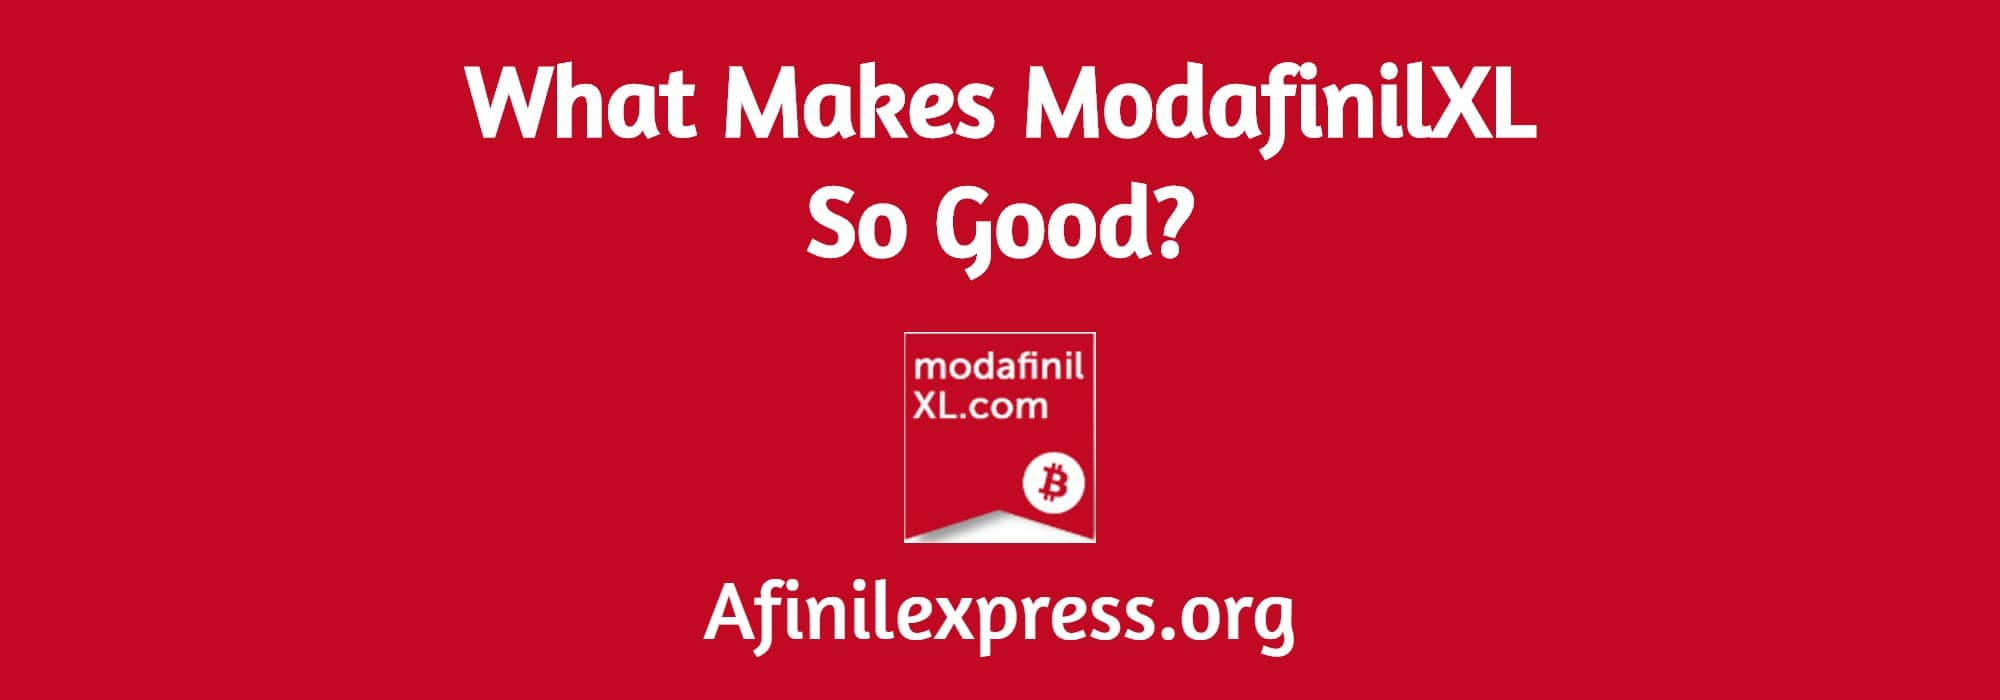 modafinilxl.com @ afinilexpress.org